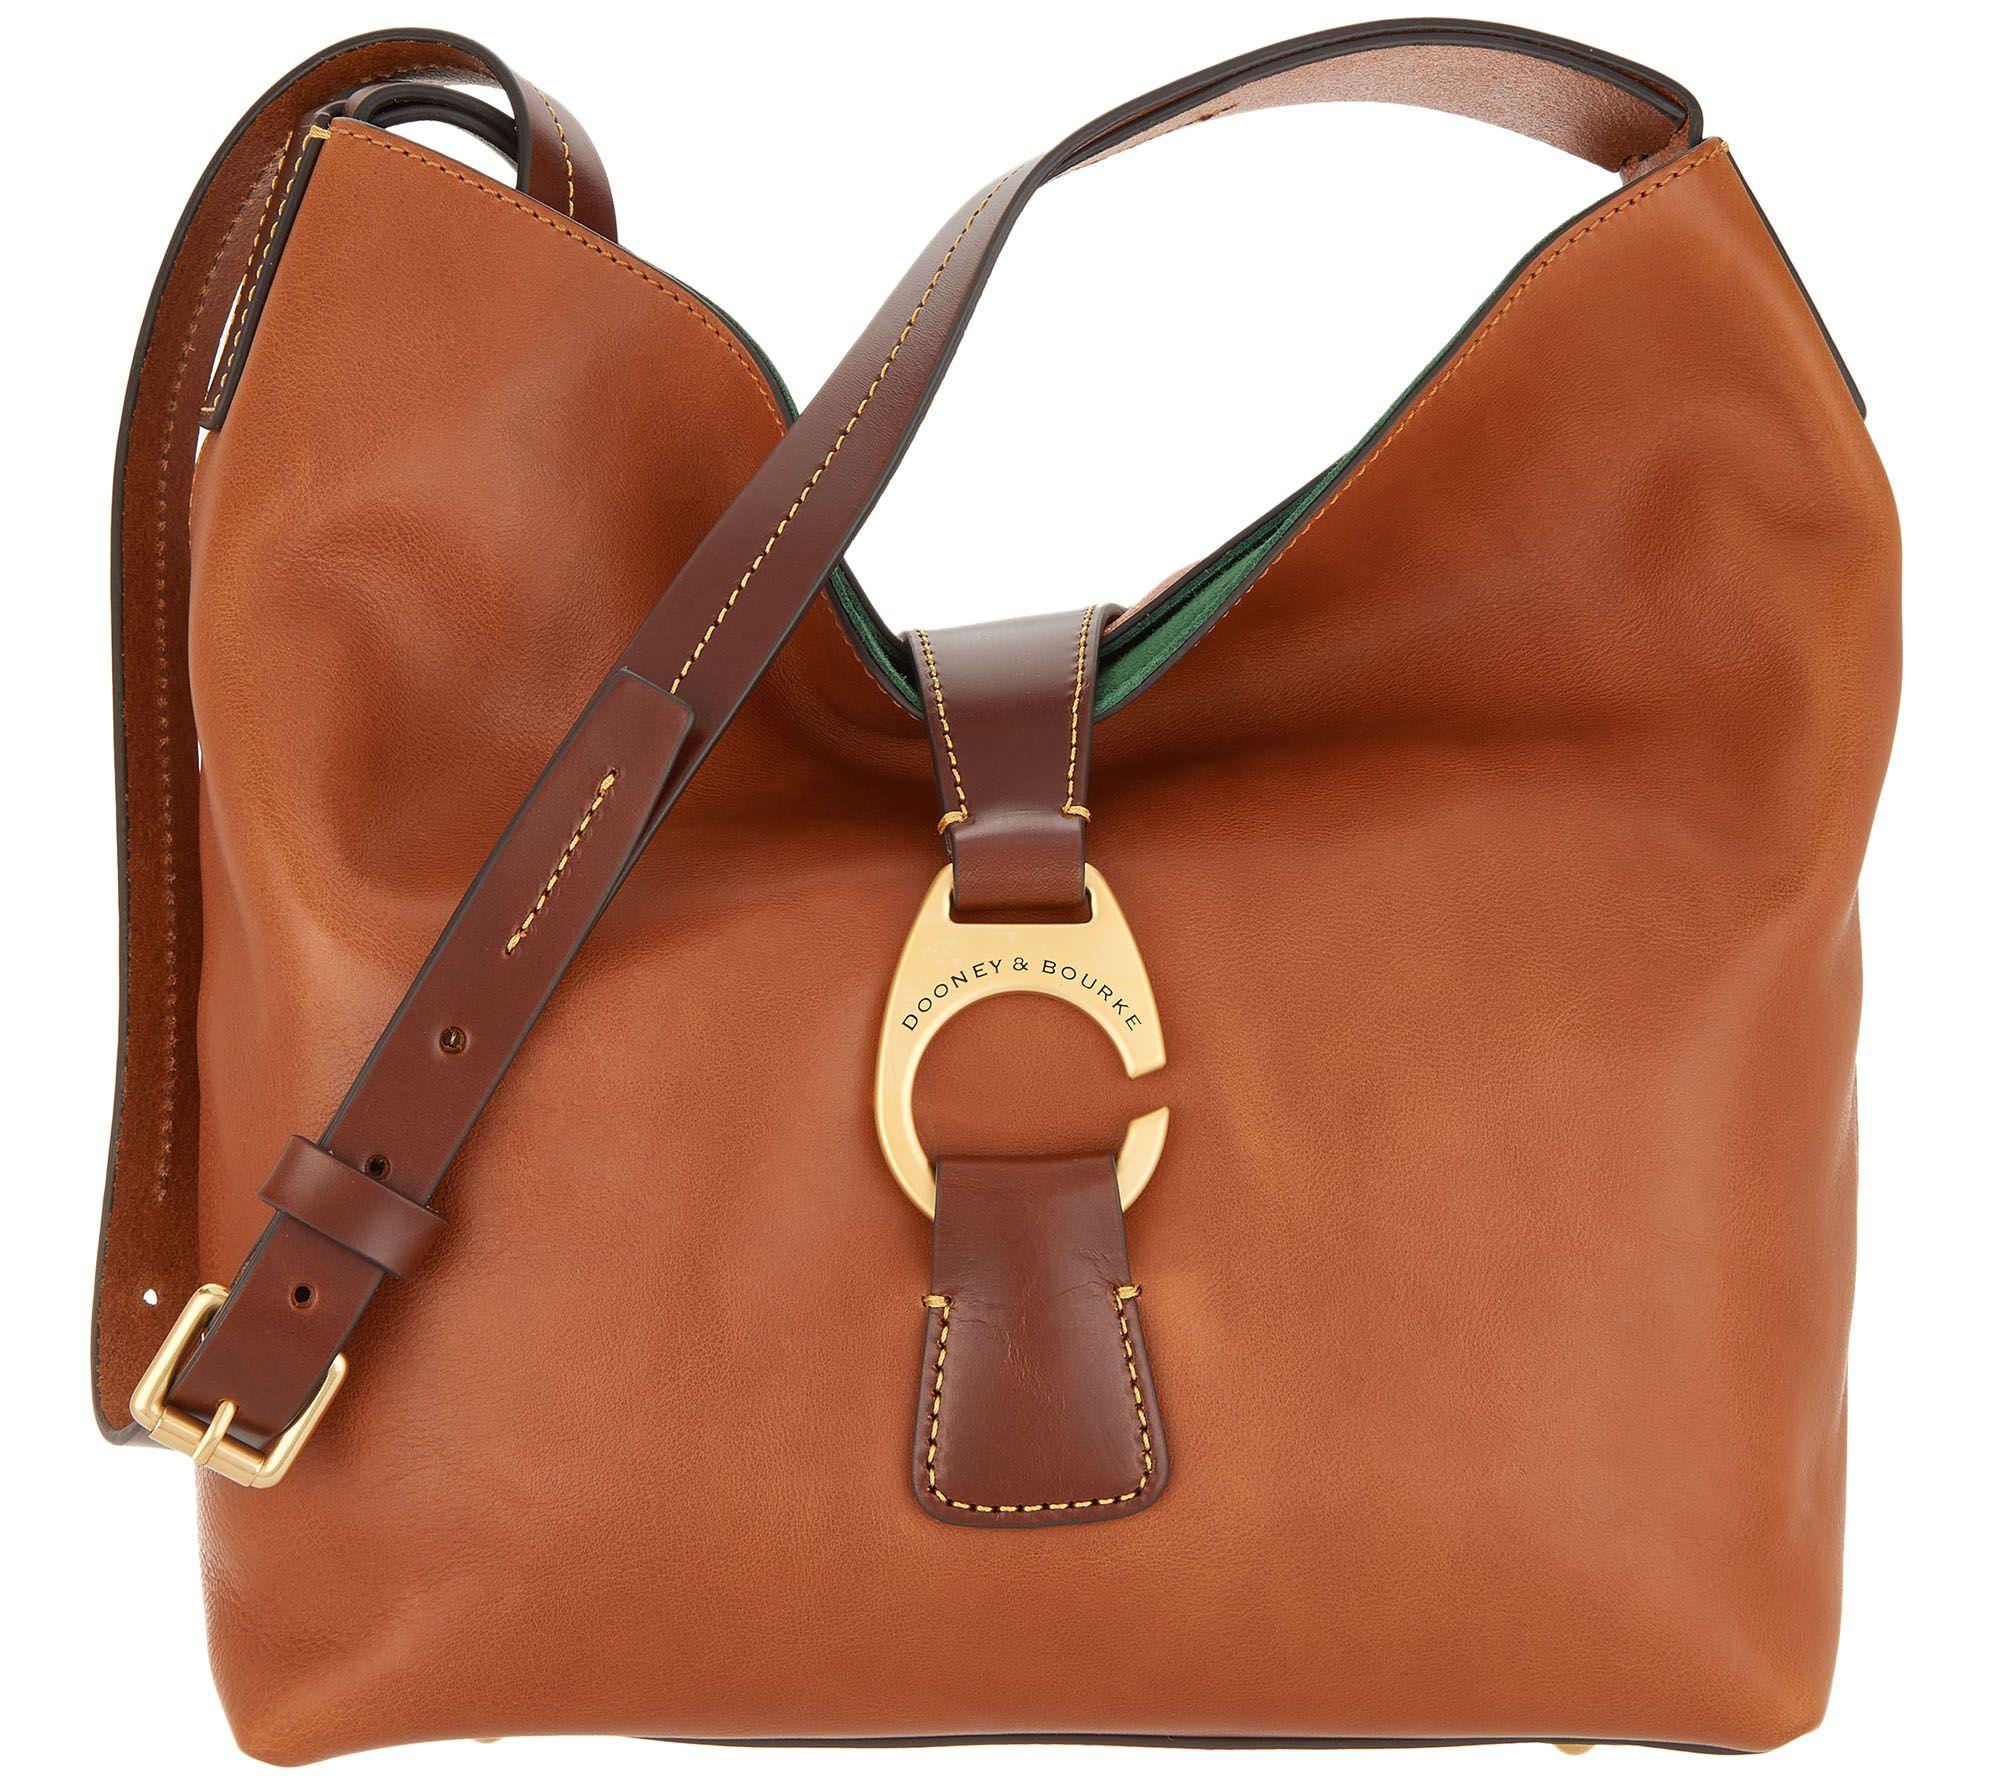 adc55194accd Dooney & Bourke Florentine Crossbody Hobo Handbag - Derby — QVC.com